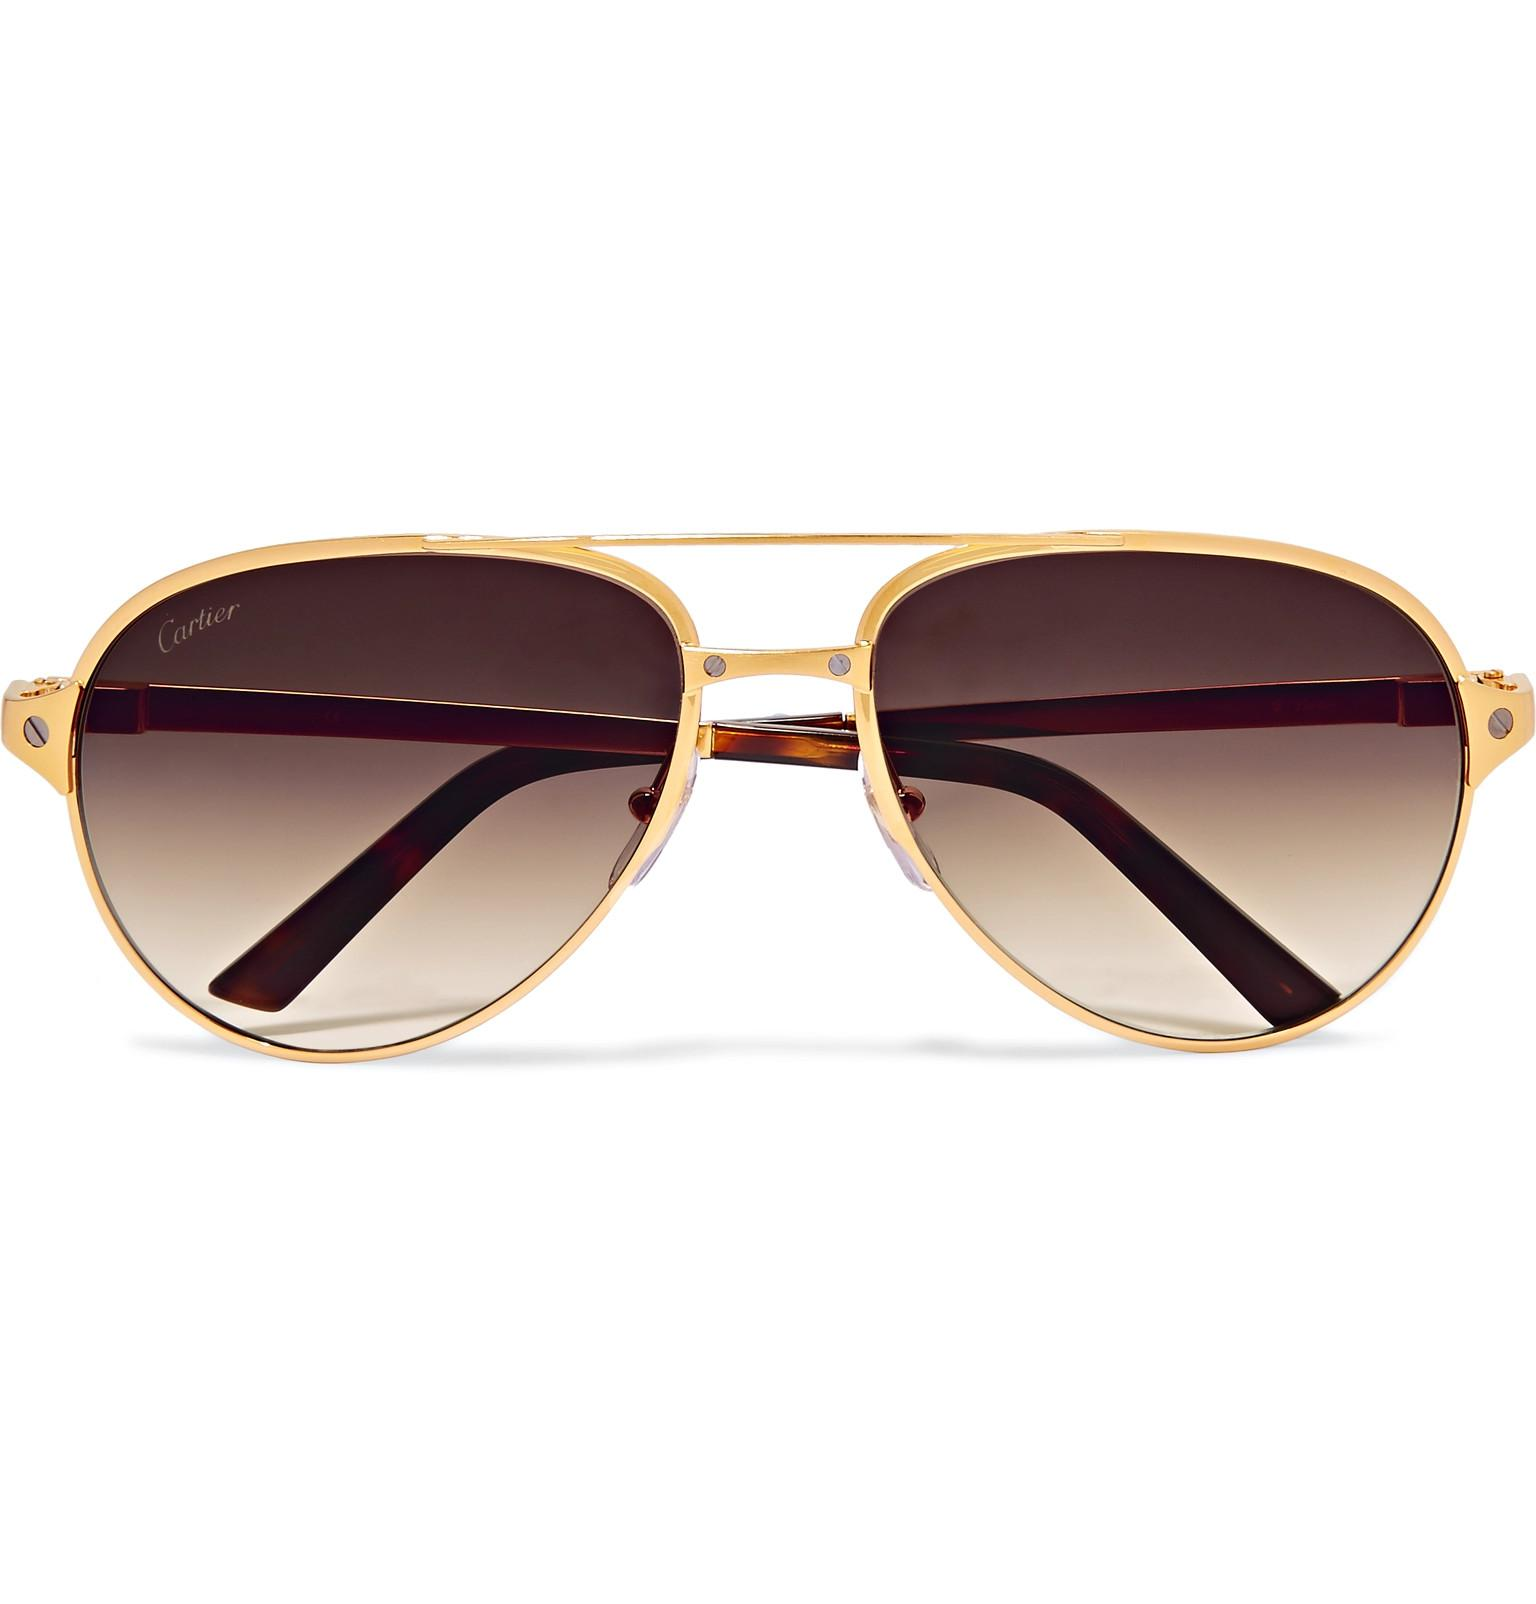 Leather Gold De Trimmed Cartier Lyst Style Aviator Santos g8ywnzyqA7